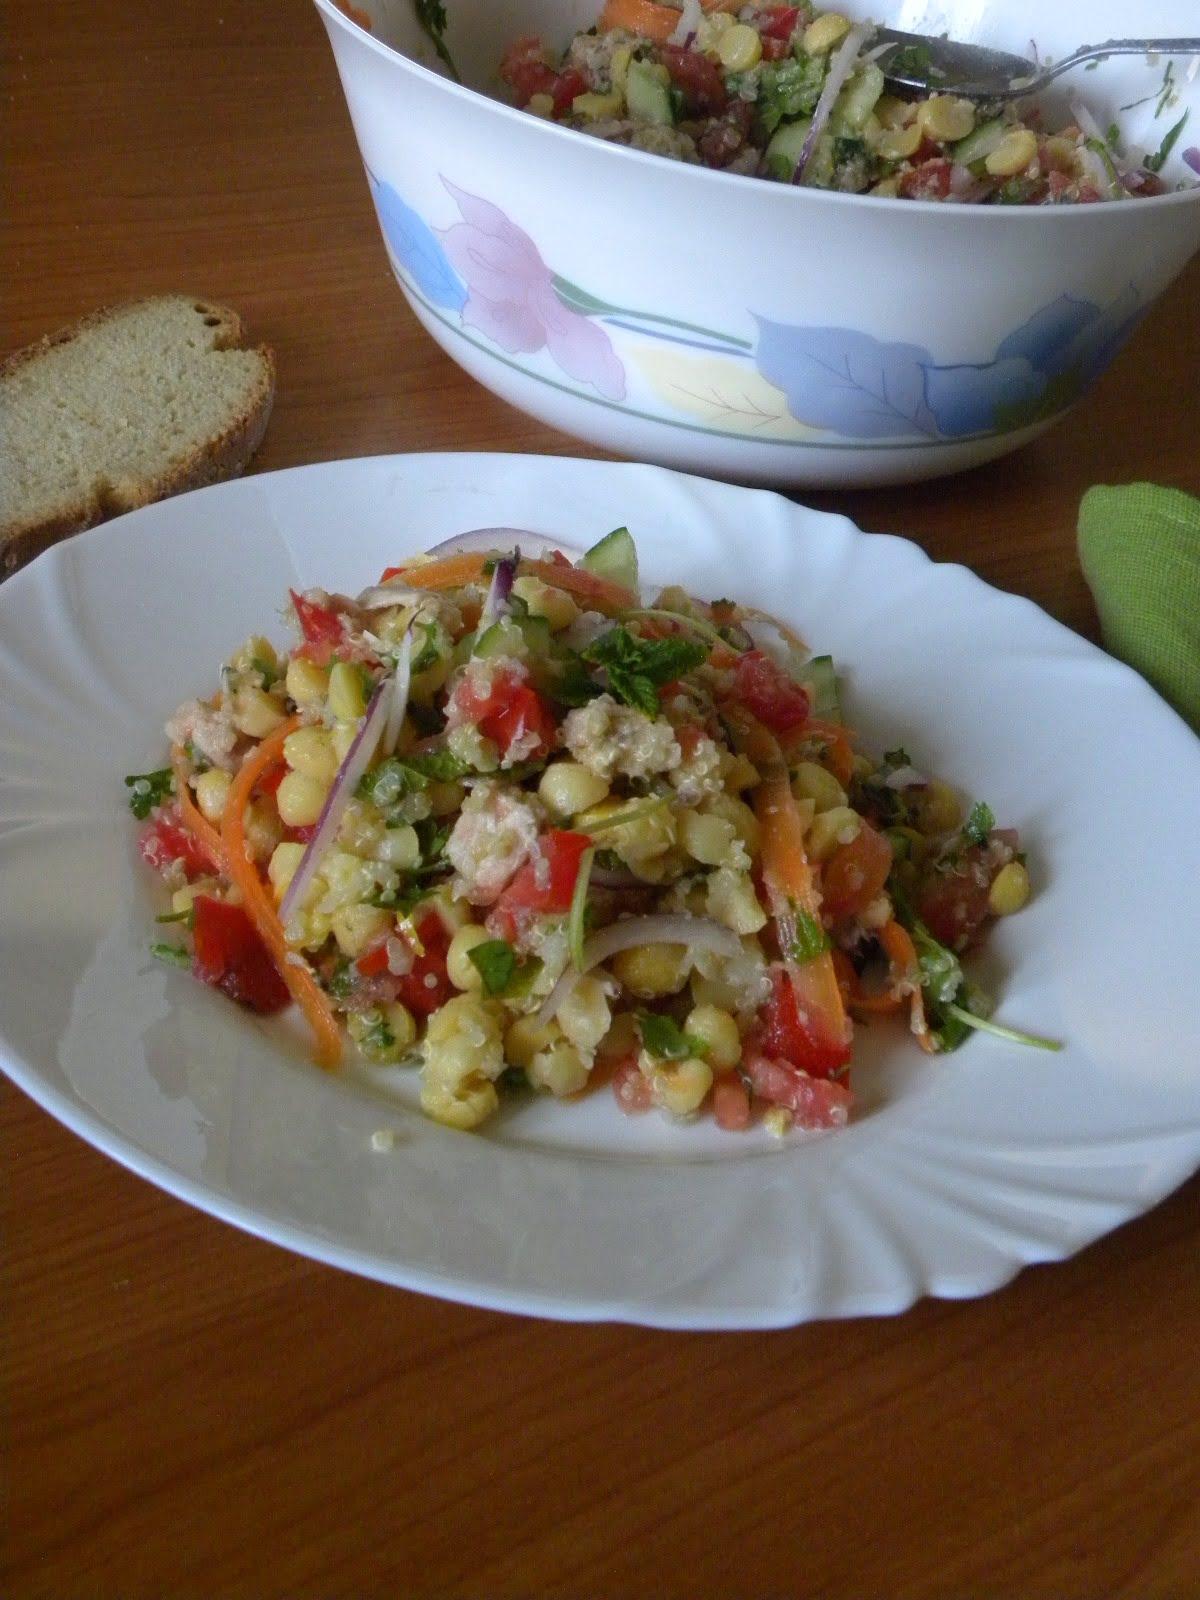 Greek Vegan Chickpea Salad With Quinoa & Tahini Sauce